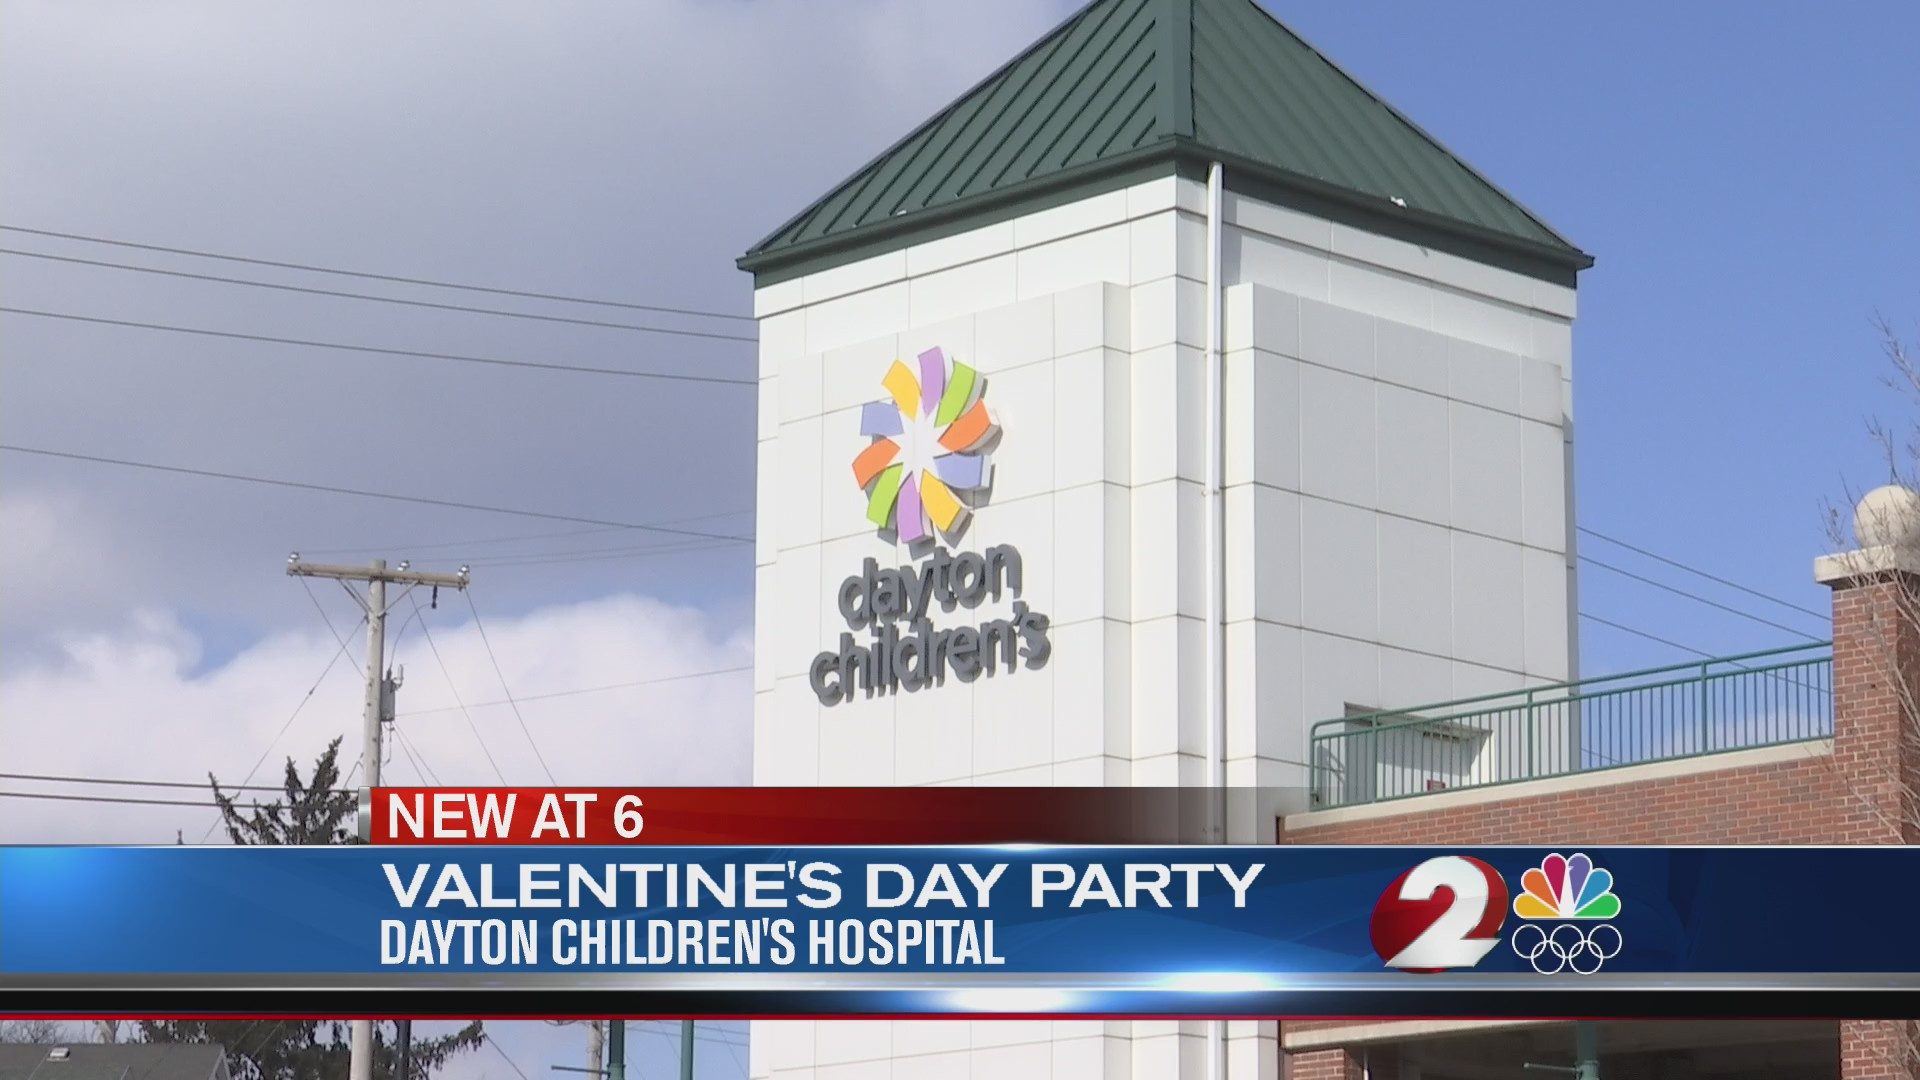 Special Valentine's Day party held at Dayton Children's